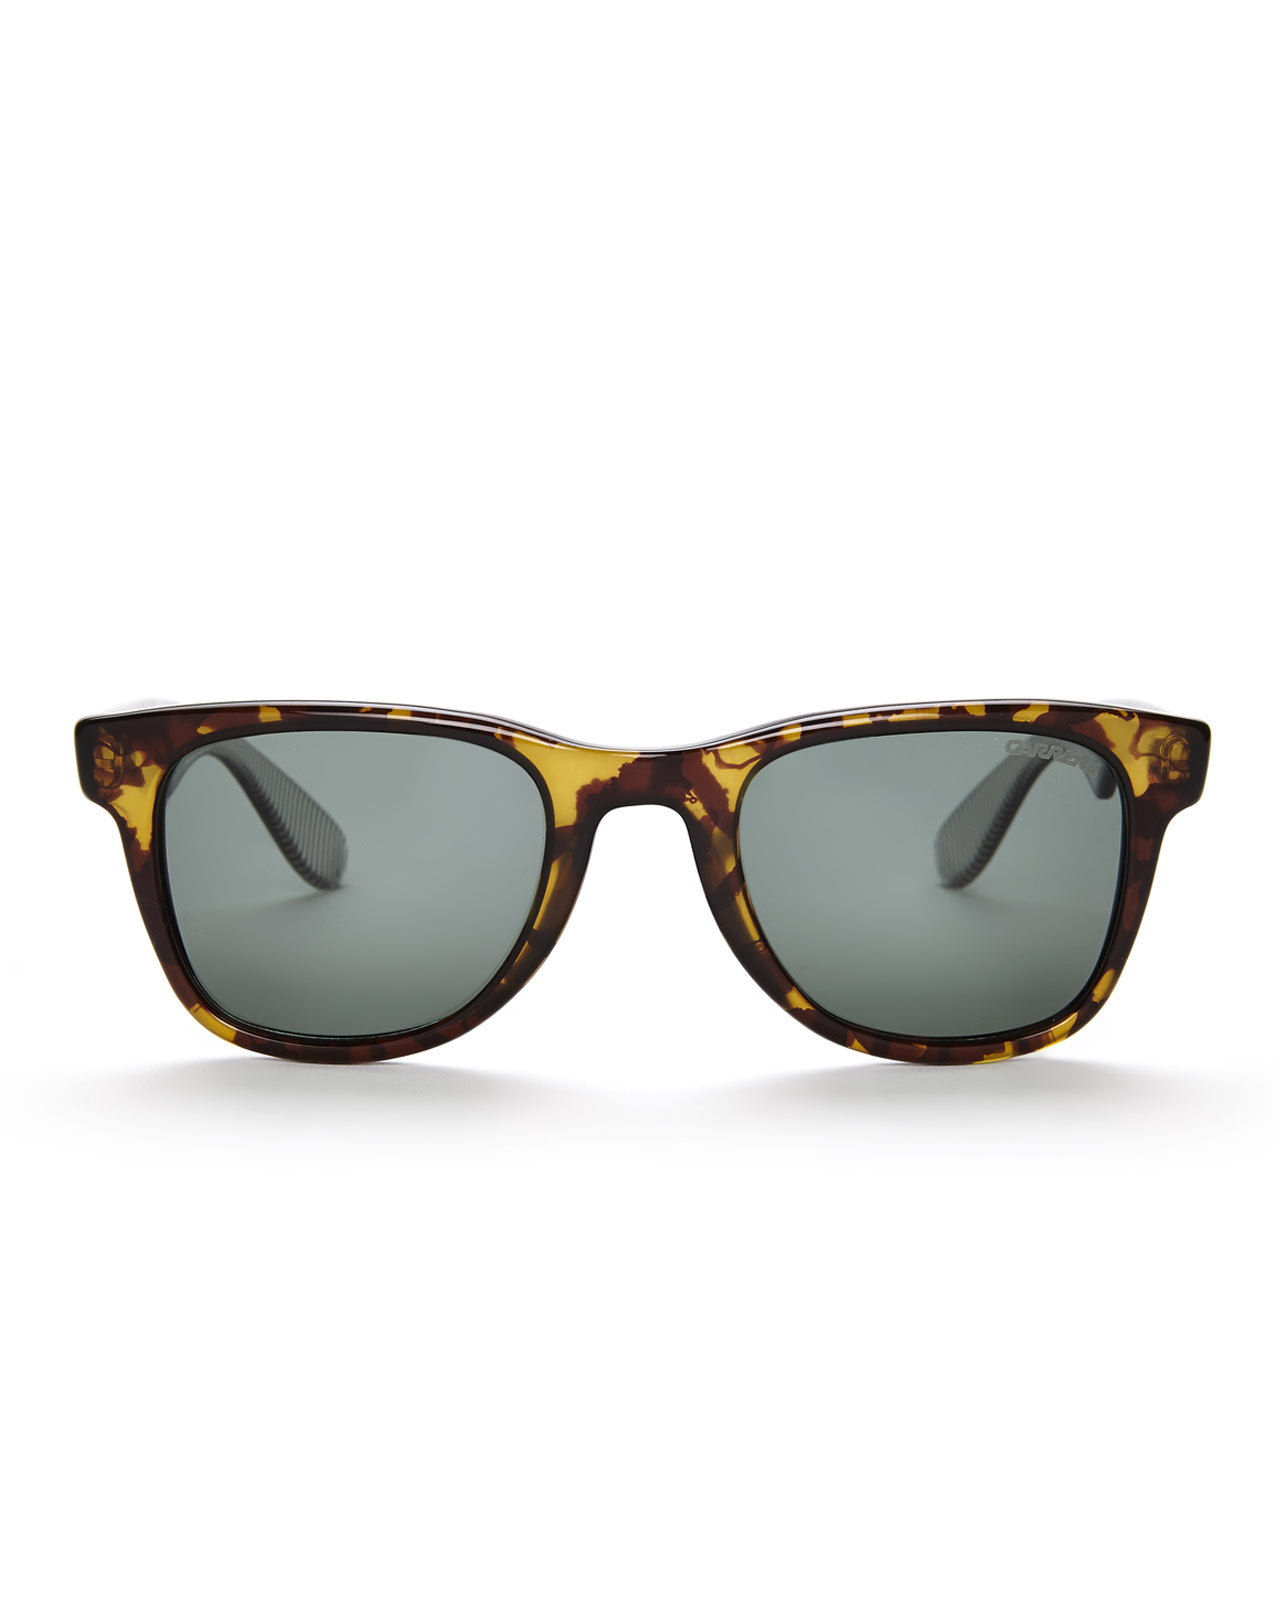 904257e14c Lyst - Carrera 6000 Yellow Printed Polarized Wayfarer Sunglasses in ...